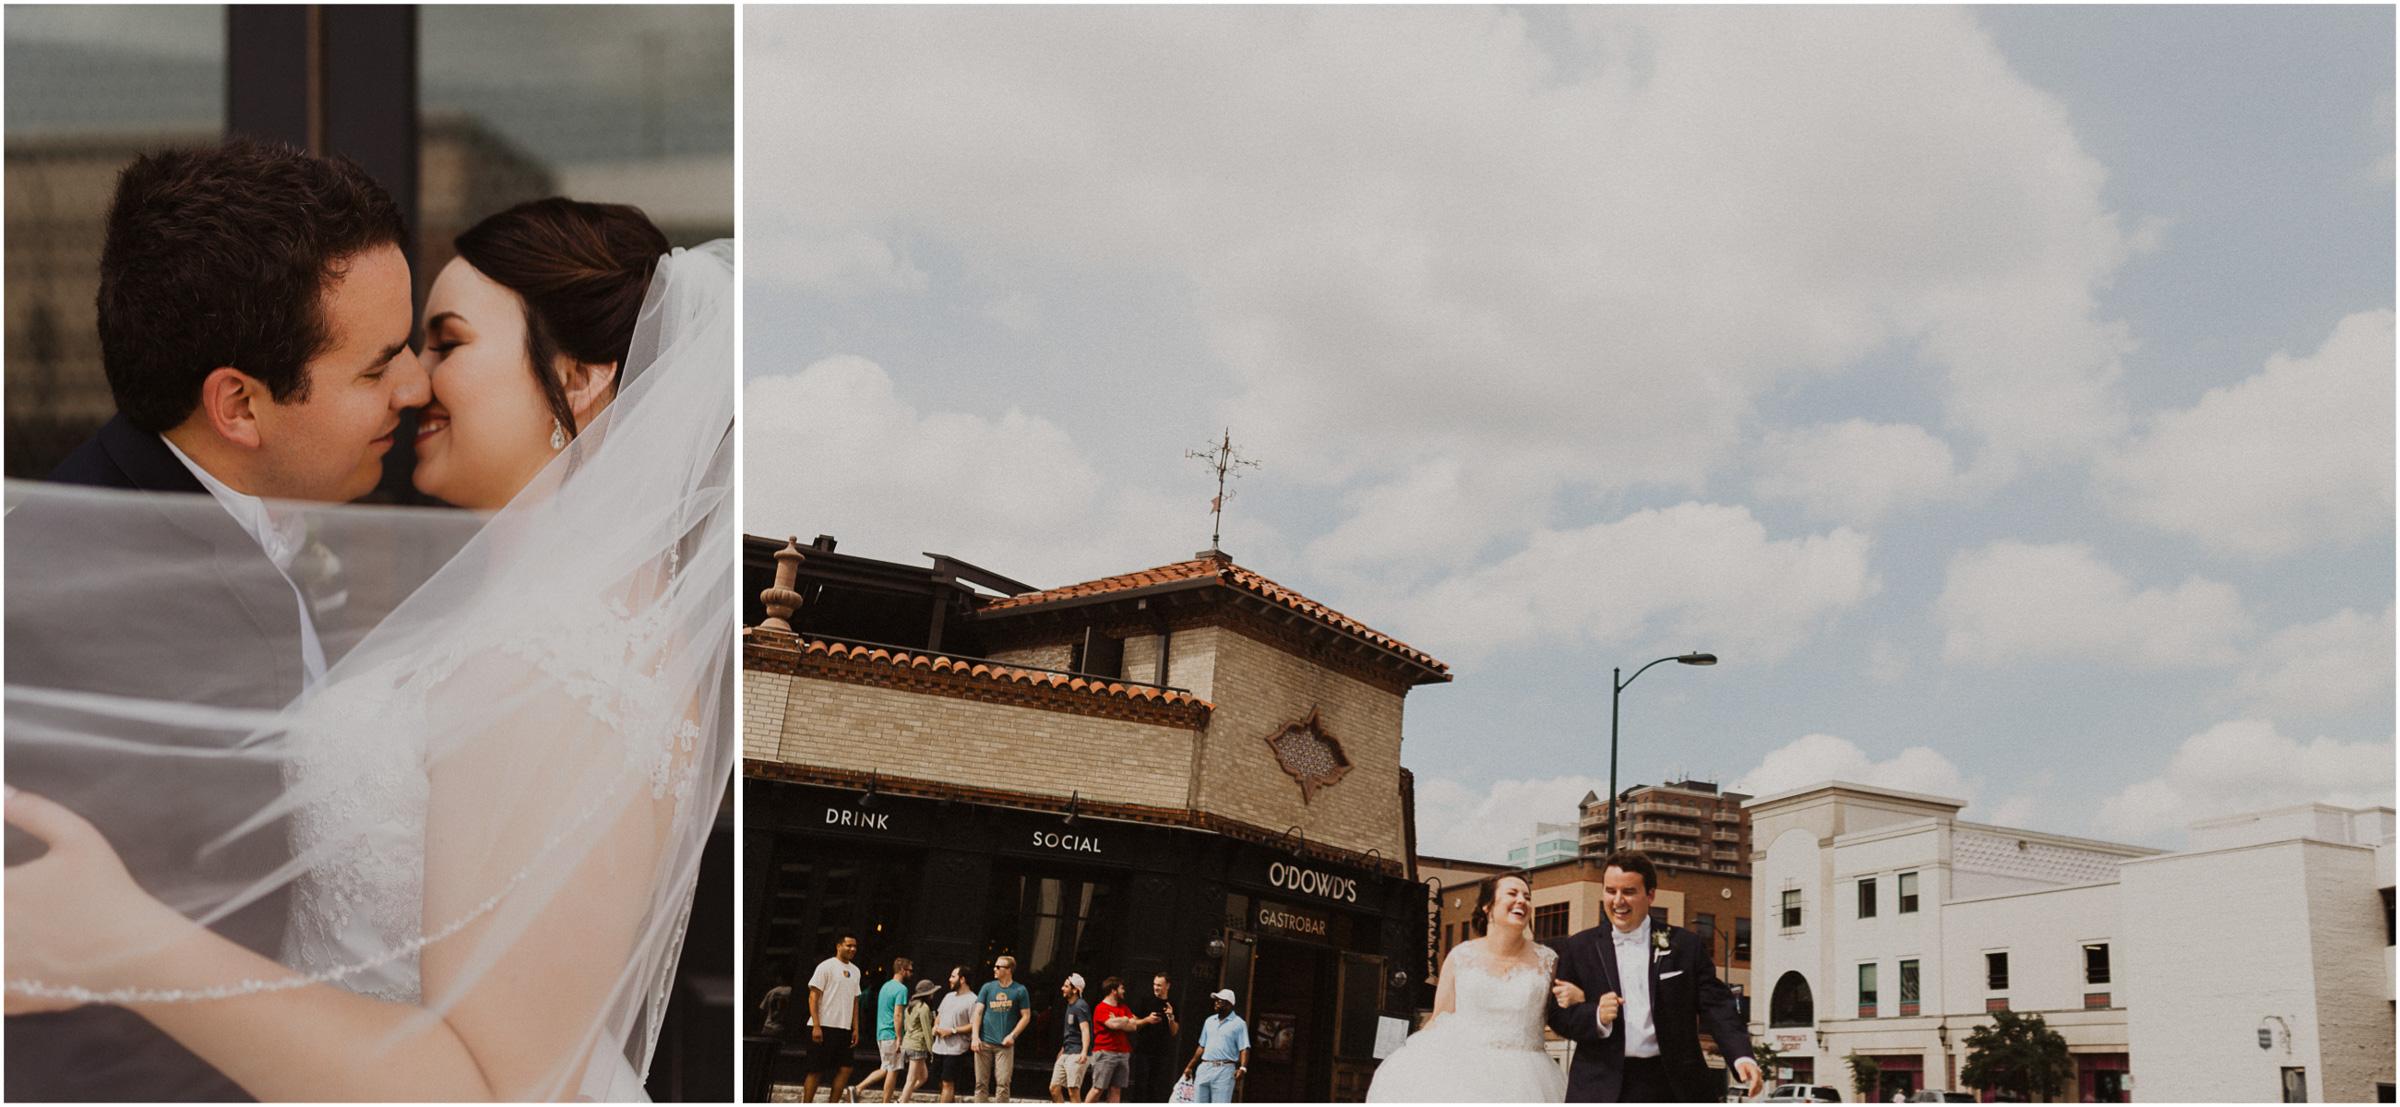 alyssa barletter photography classic kansas city wedding loose park plaza country club summer wedding-44.jpg